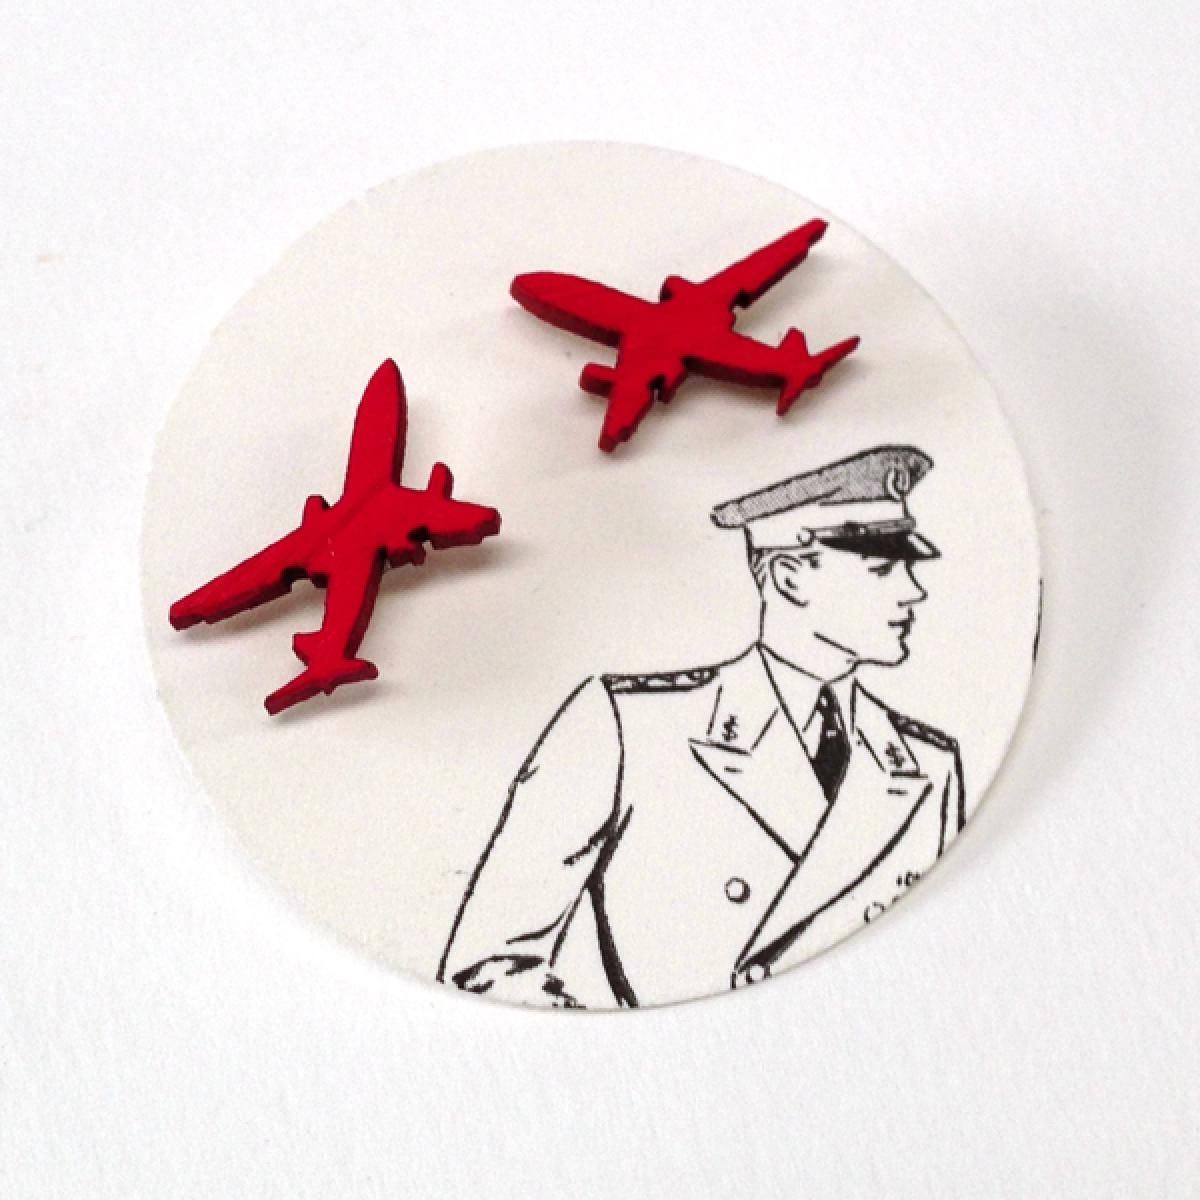 aeroplane earrings // orange | NOOKROAD AUD $12.00